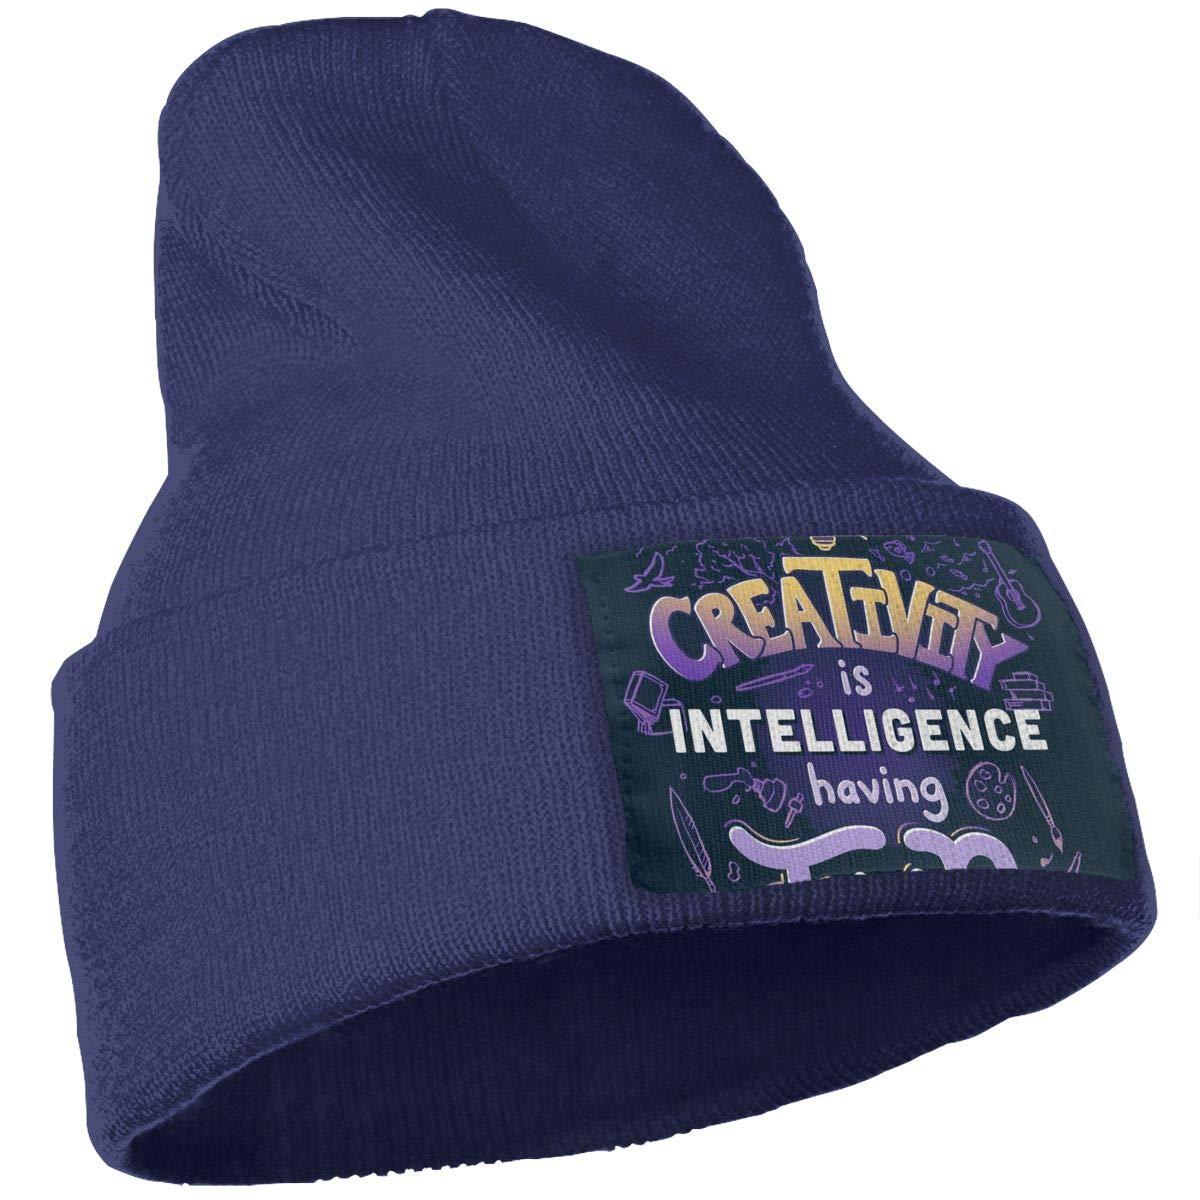 JimHappy Creativity is Intelligence Having Fun Winter Warm Hats,Knit Slouchy Thick Skull Cap Black